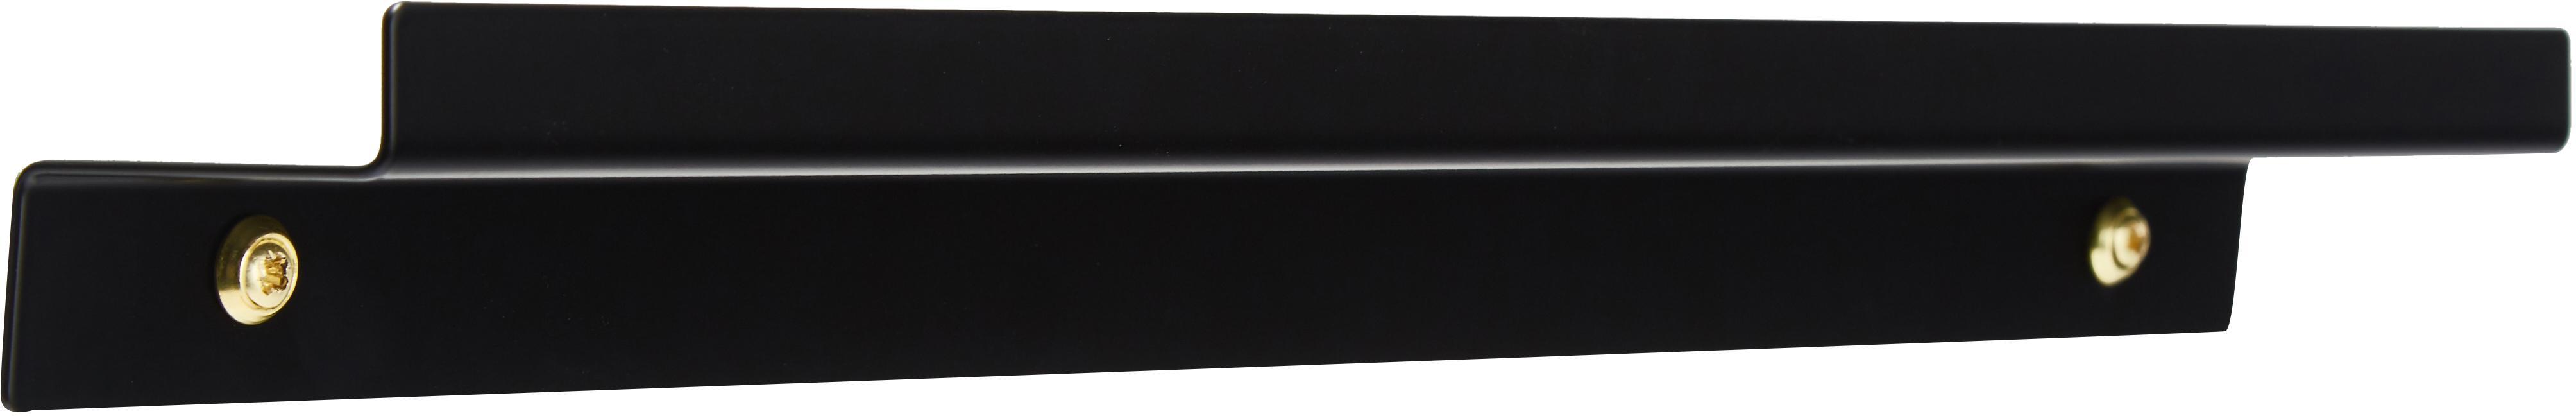 Estante estrecho para cuadros Shelfini, Estante: metal, pintado, Negro, latón, An 50 x Al 6 cm